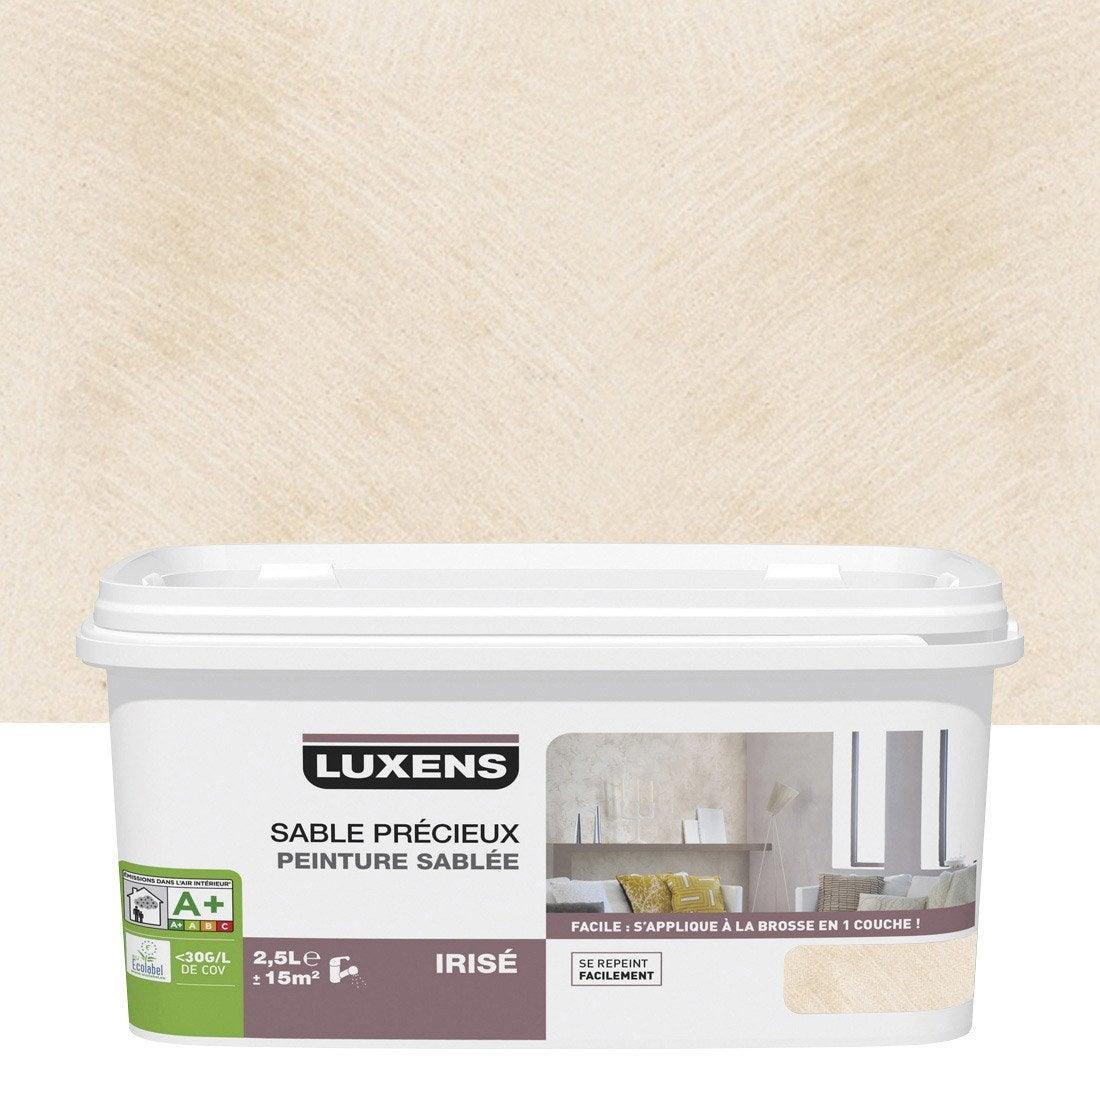 Peinture effet sable pr cieux luxens blanc lin 6 2 5 l leroy merlin - Peinture facade maison leroy merlin ...